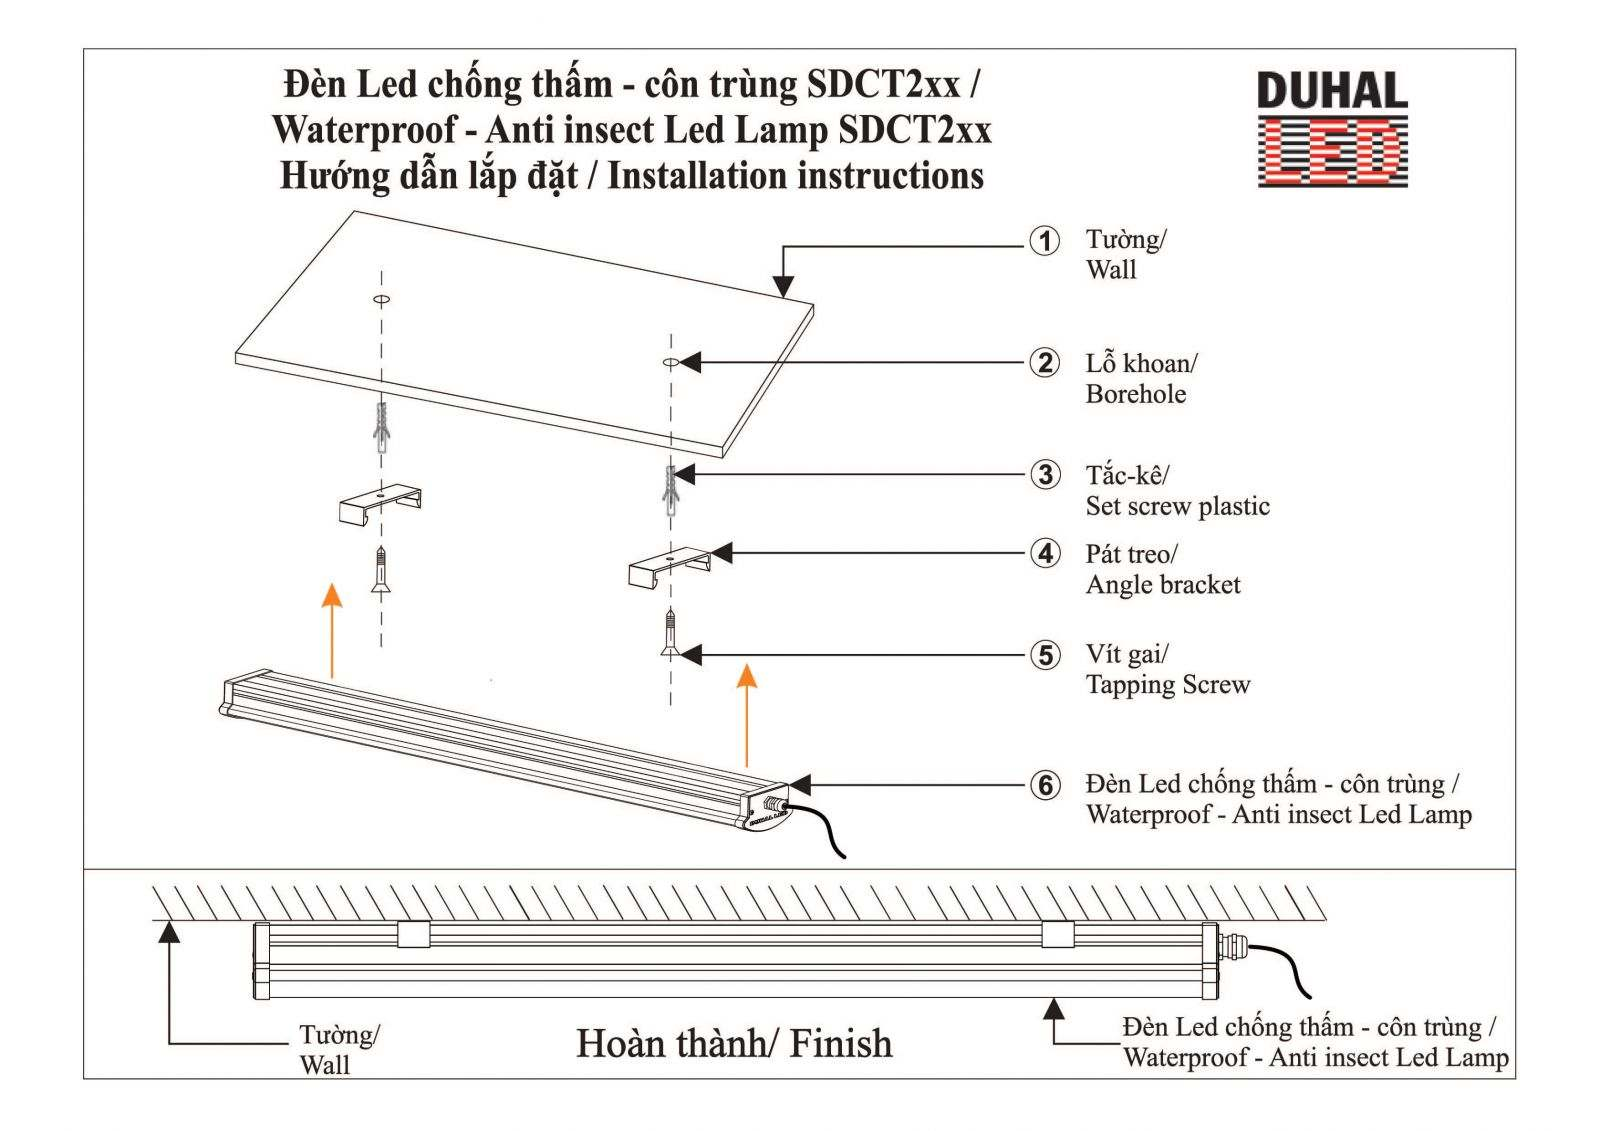 SDCT2xx-A 4-01-hdld